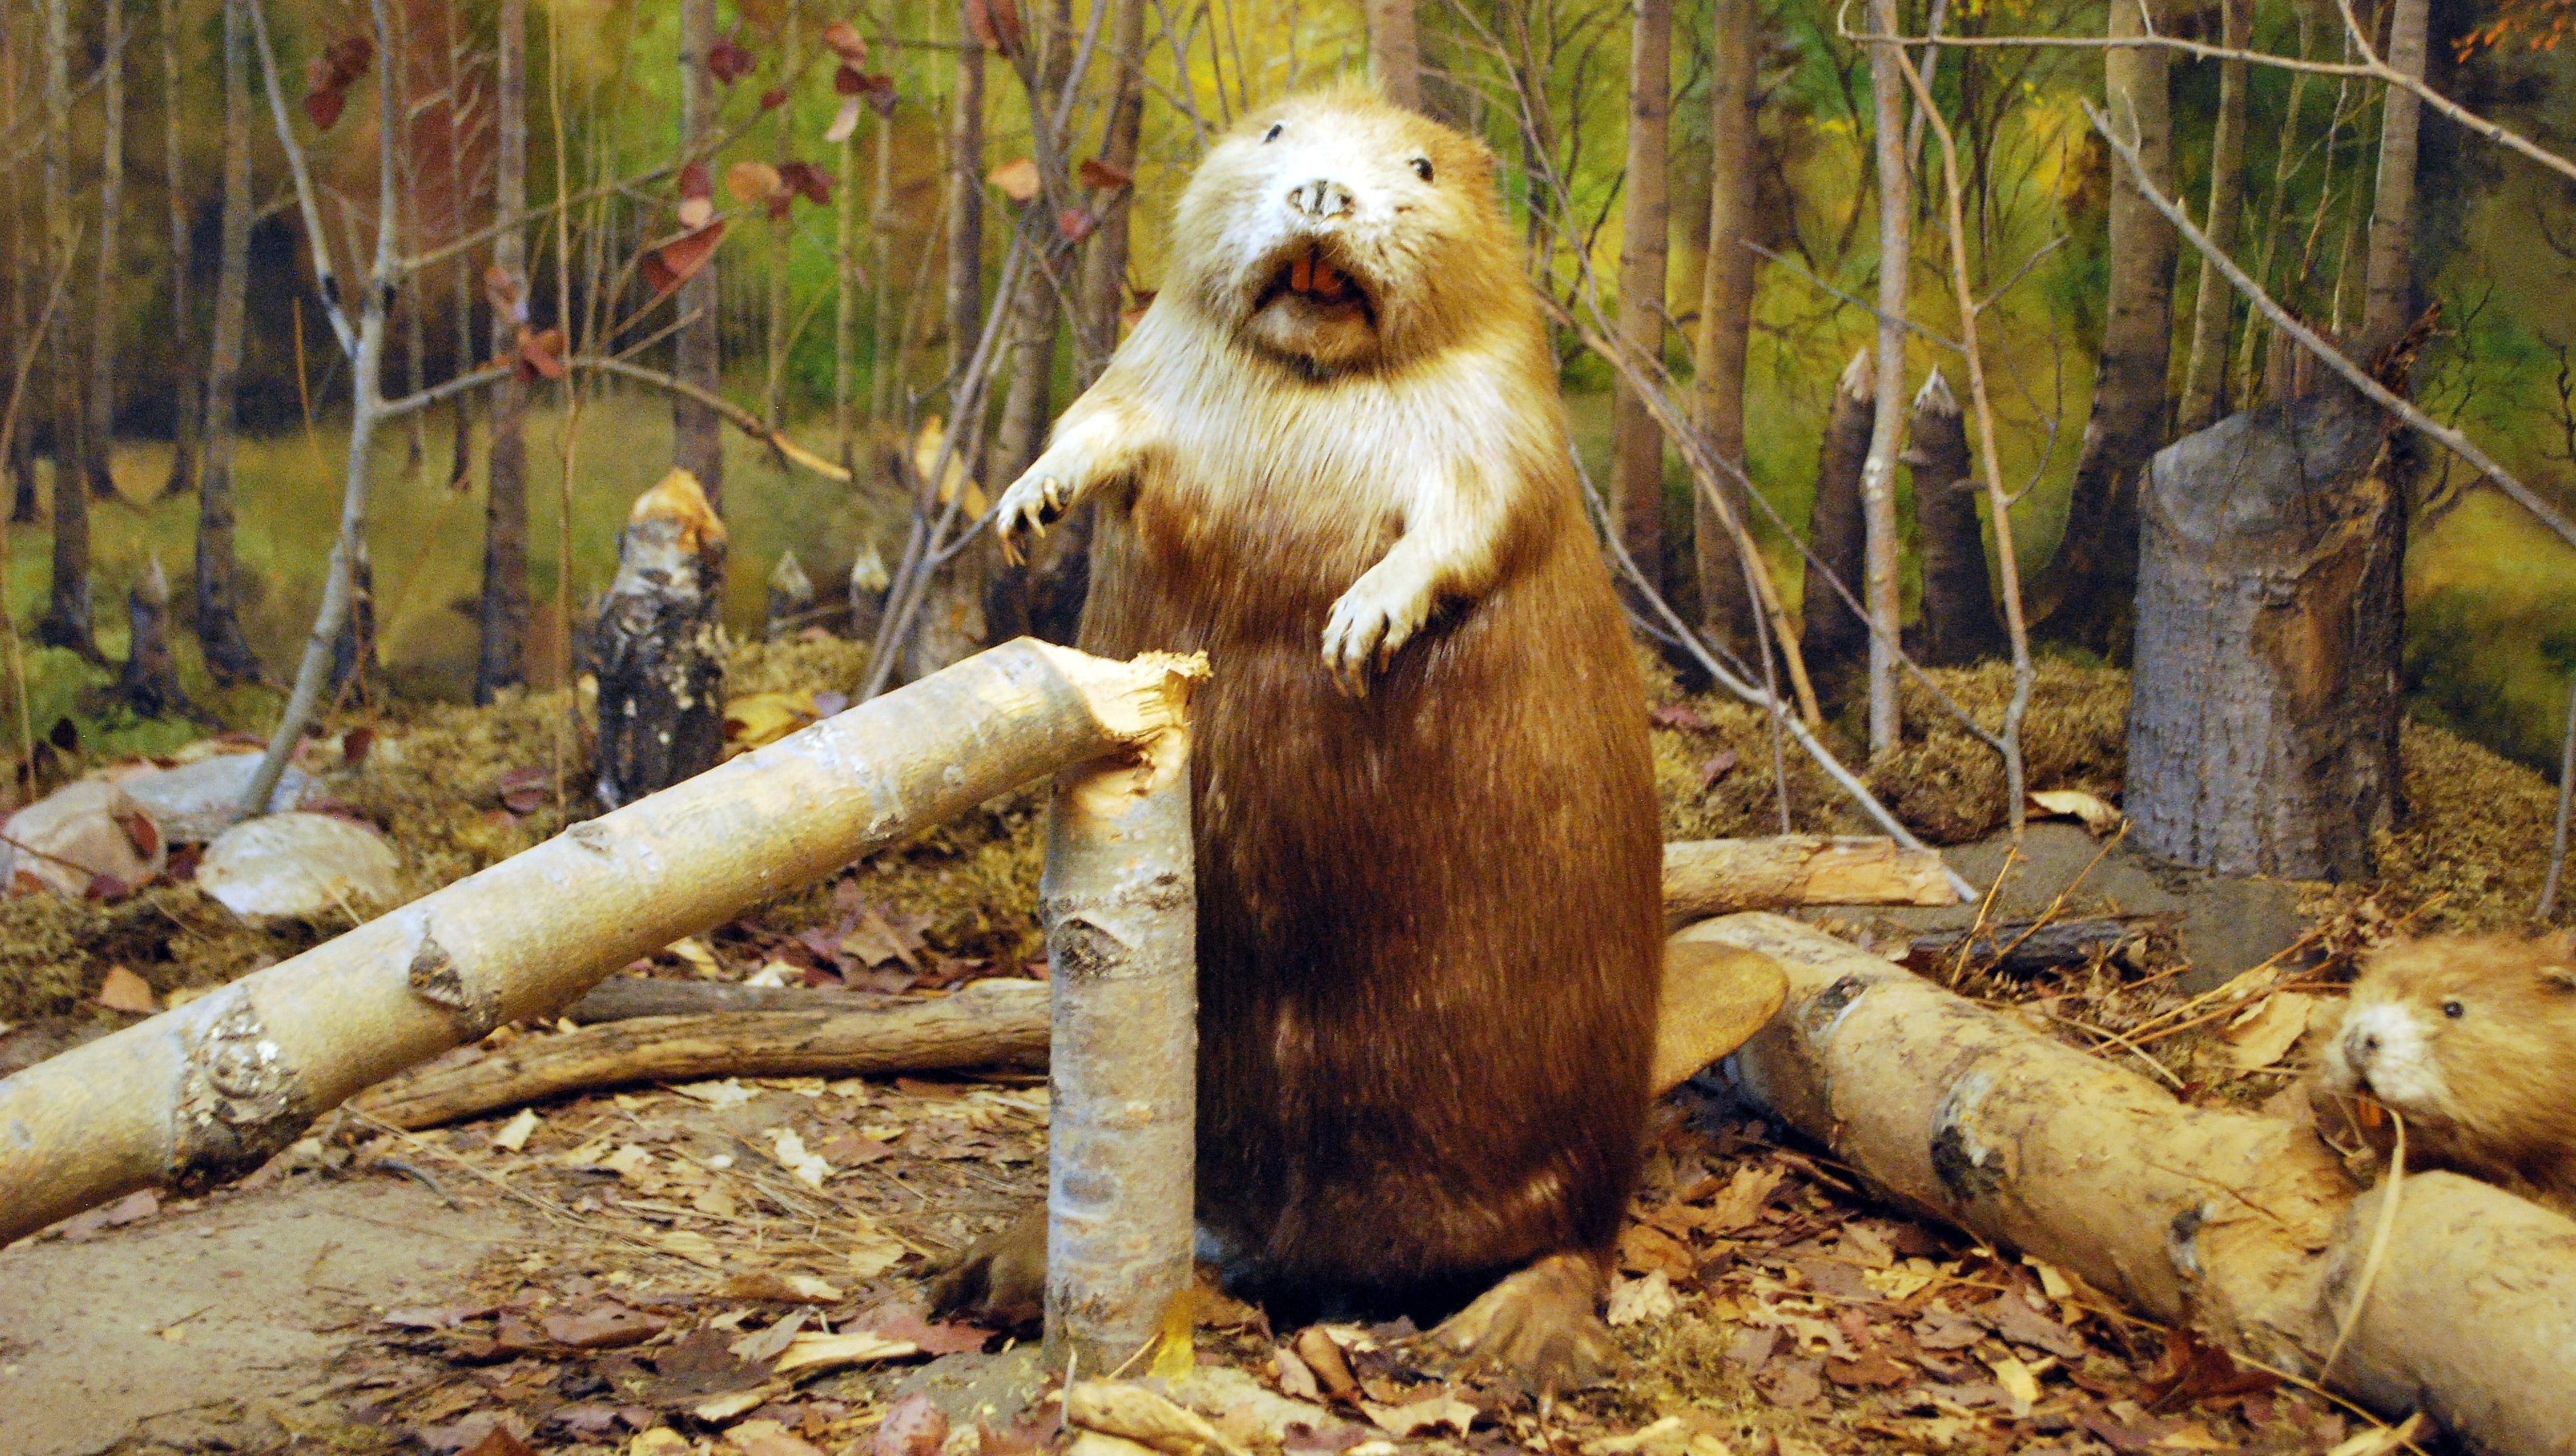 Man tries to take photo of beaver; it kills him